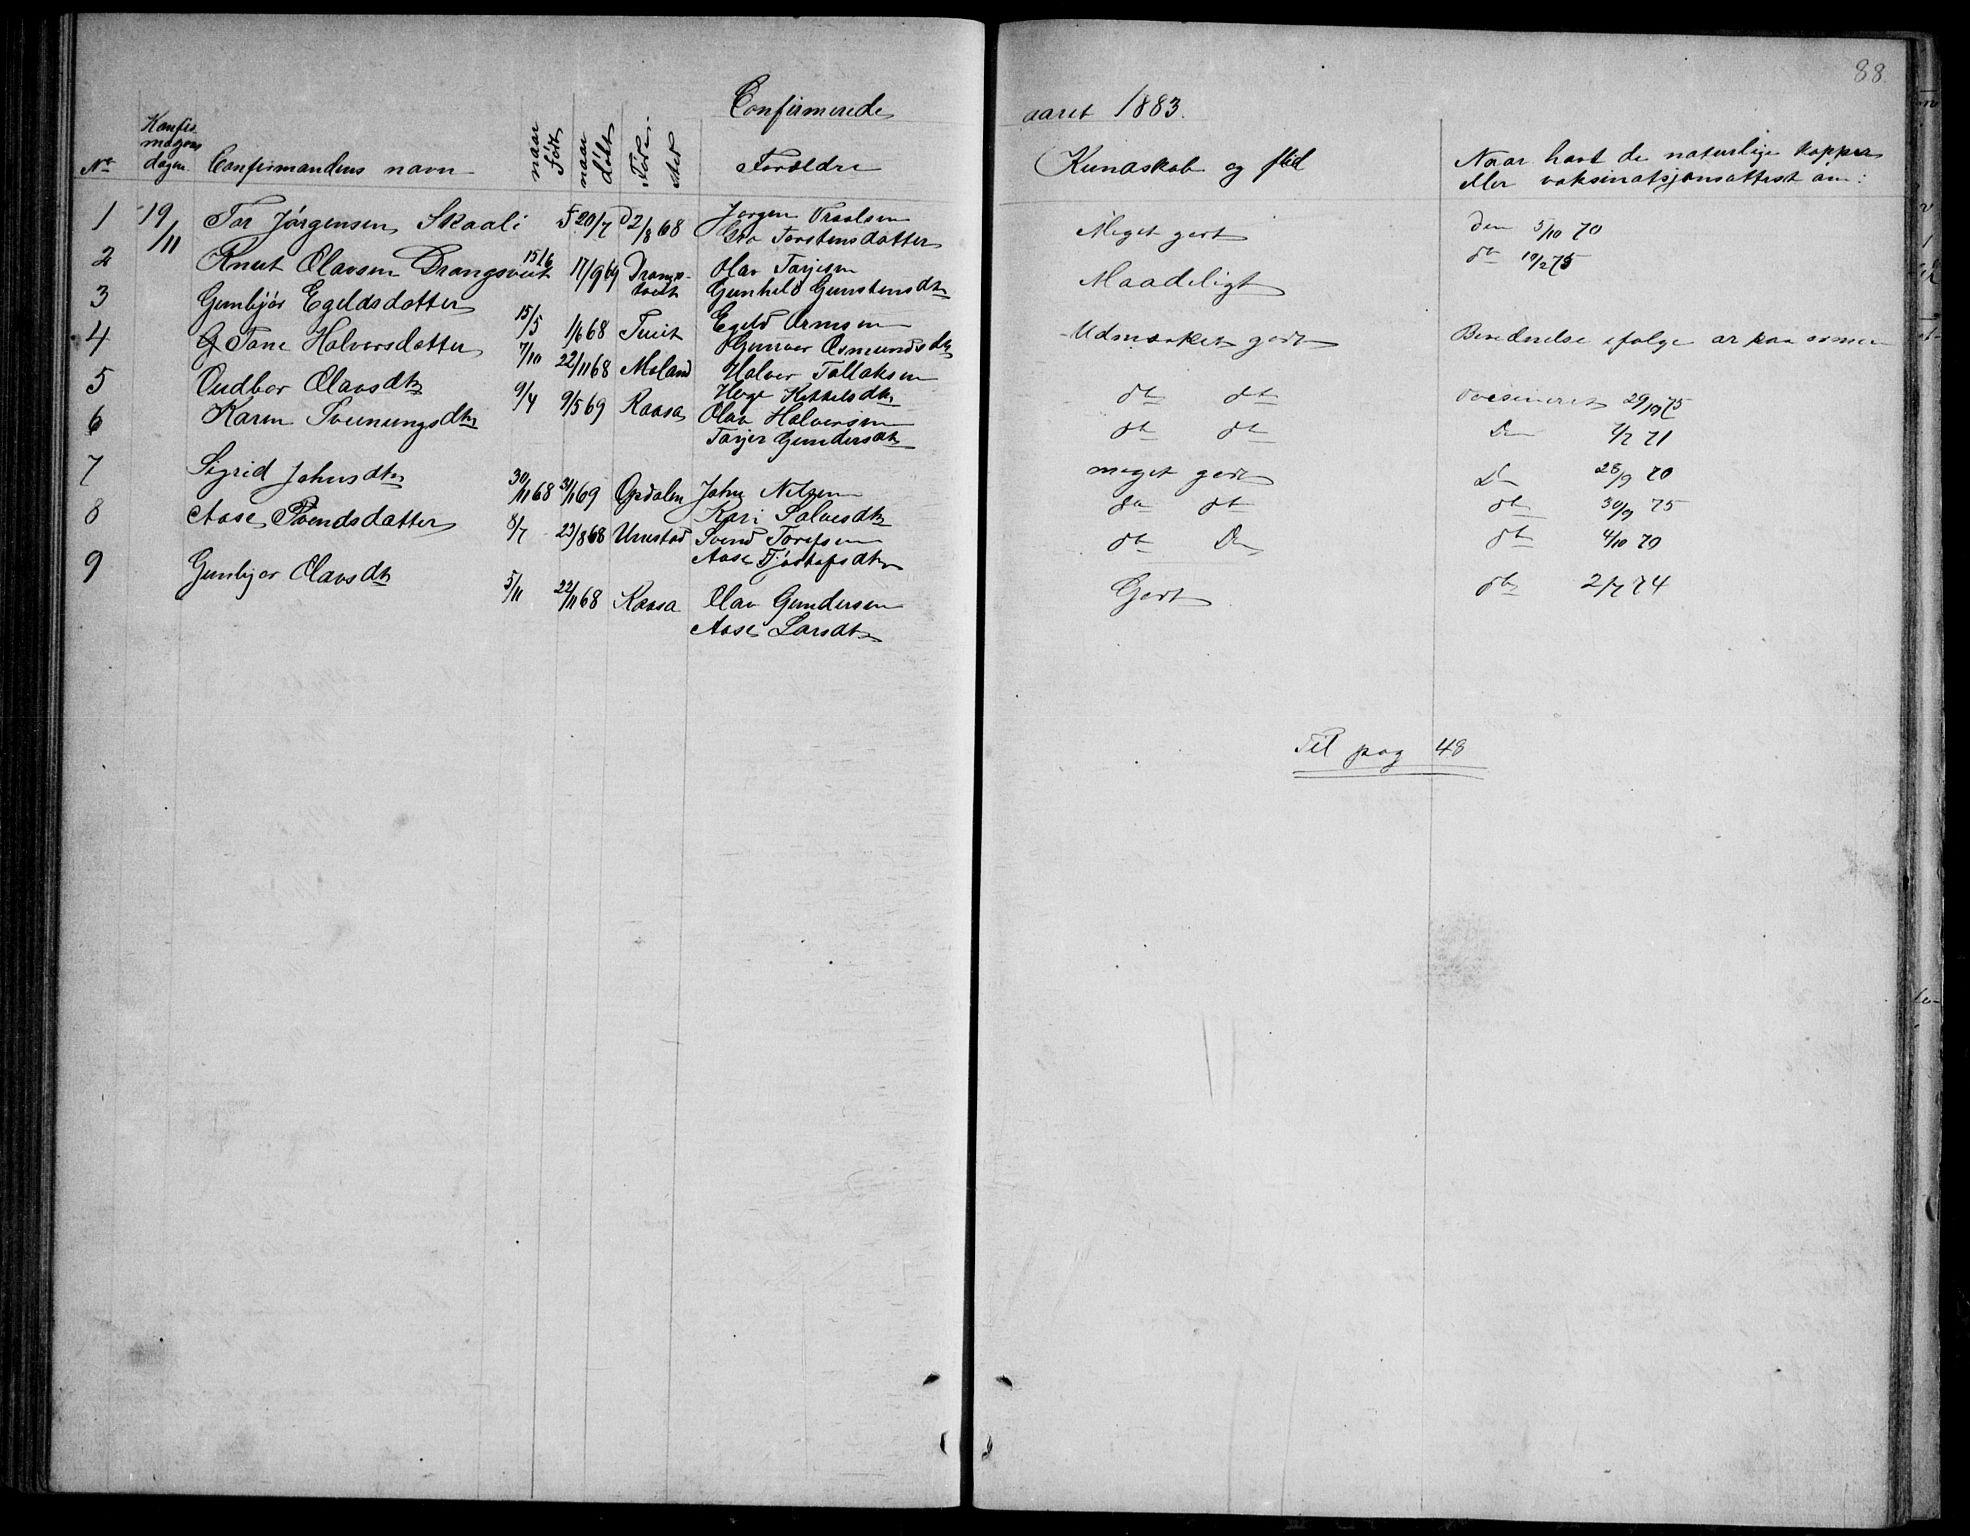 SAKO, Nissedal kirkebøker, G/Gb/L0002: Klokkerbok nr. II 2, 1863-1892, s. 88